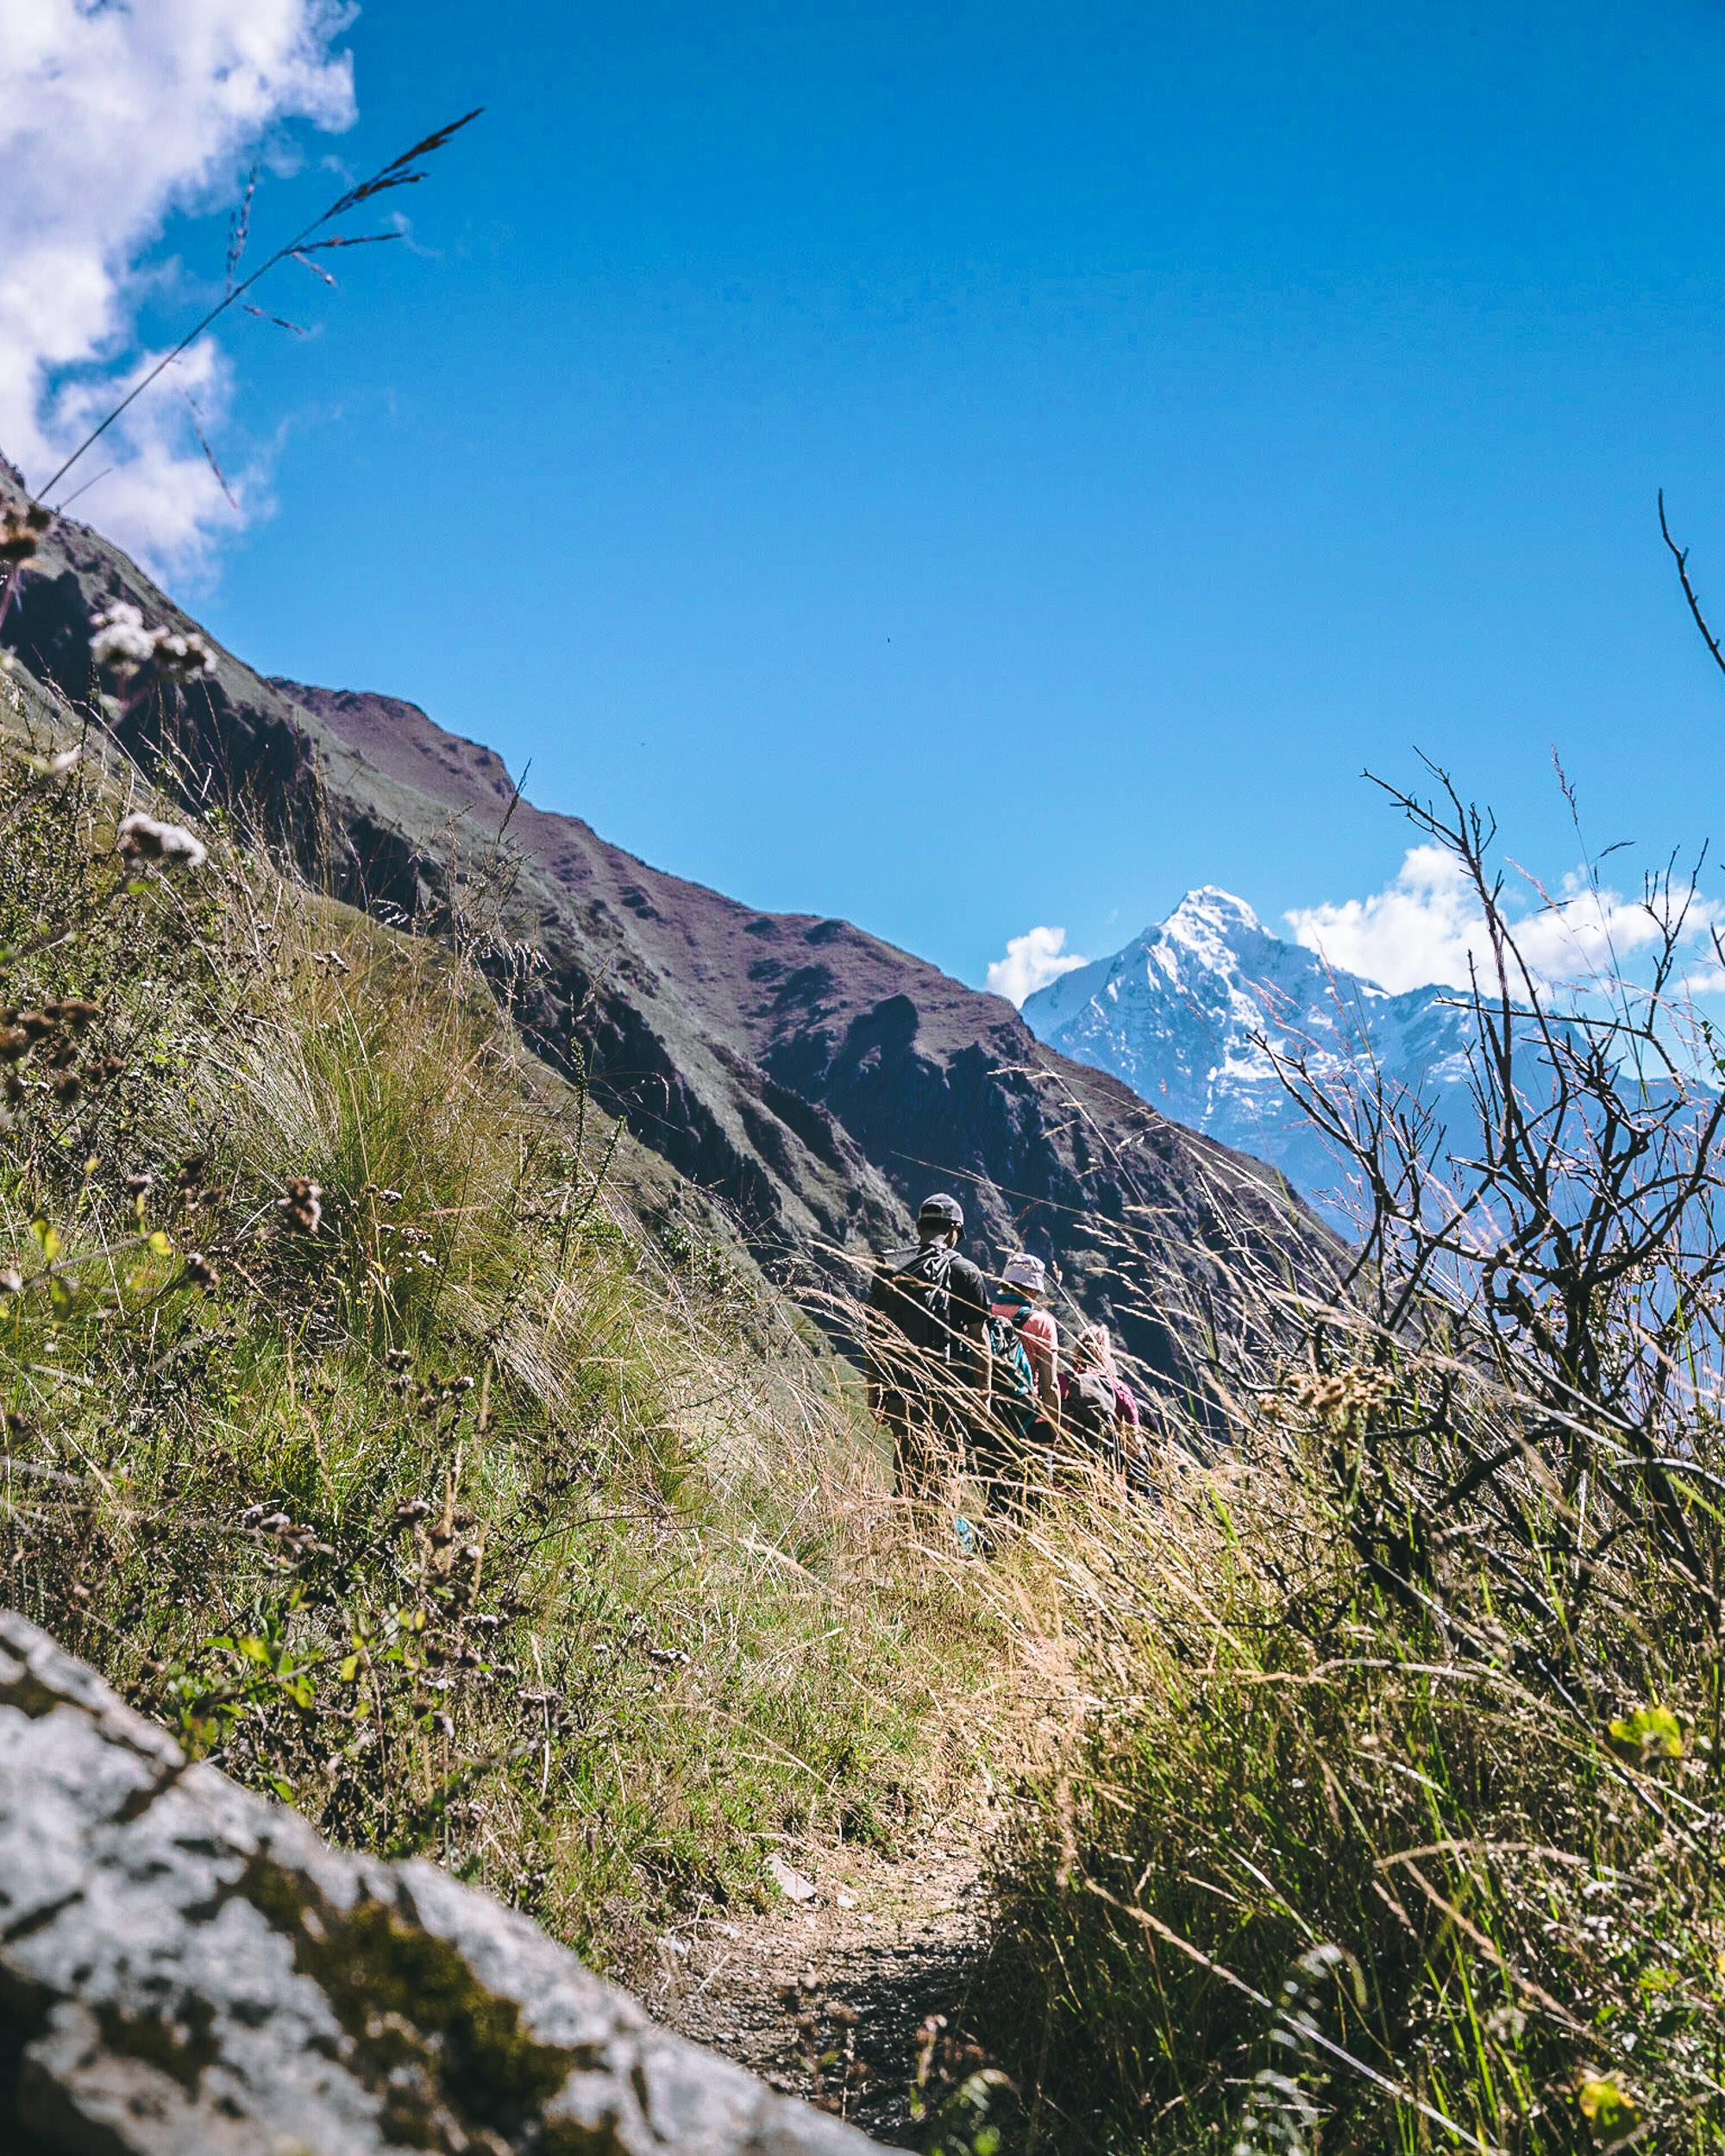 Trek To Machu Picchu - Glorious Mountain Views